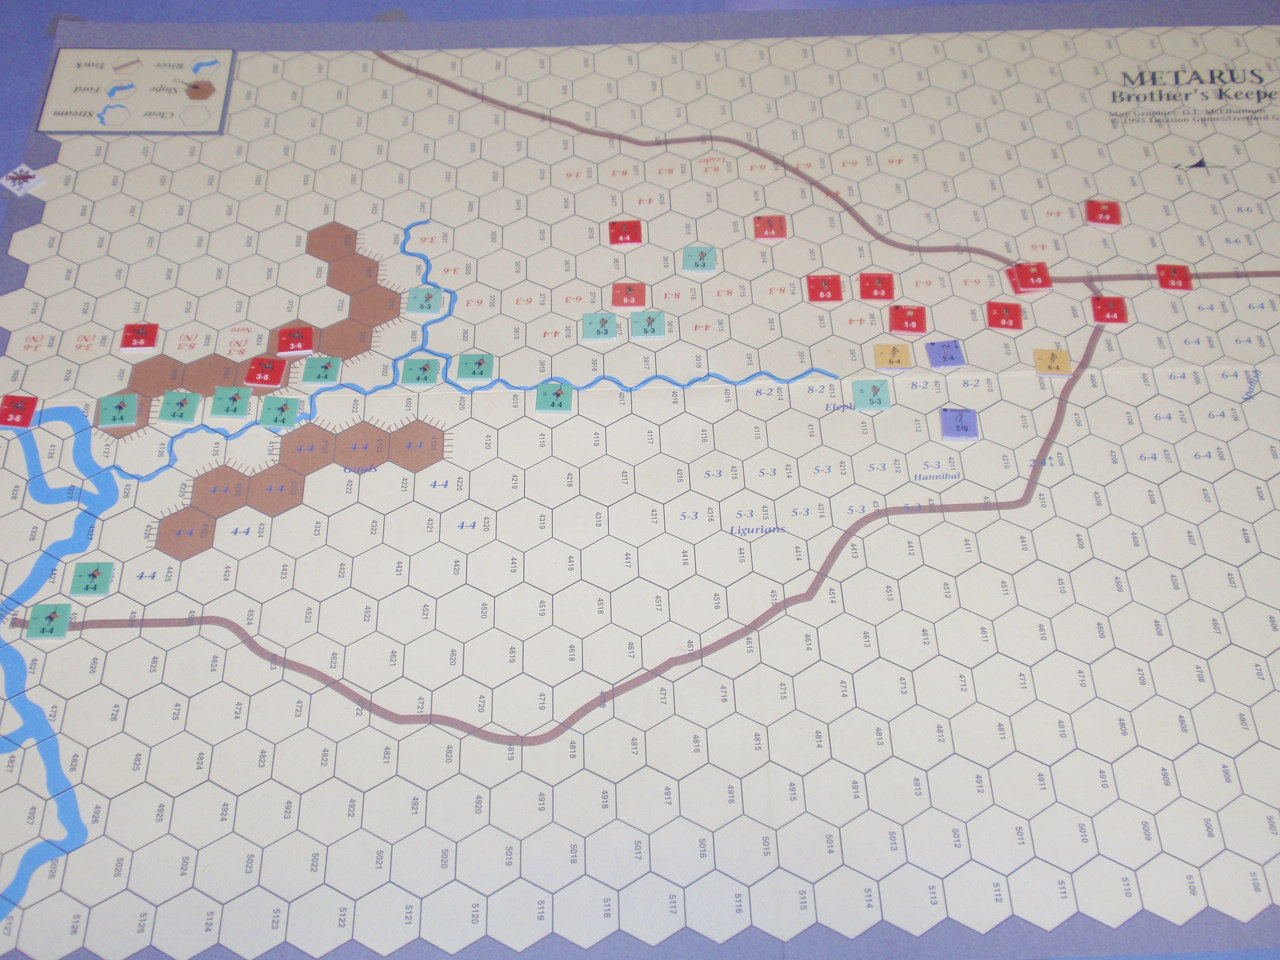 DG「Battles of the Ancient World」シリーズから「Metauras 207B.C.」をソロプレイ④_b0162202_19373668.jpg